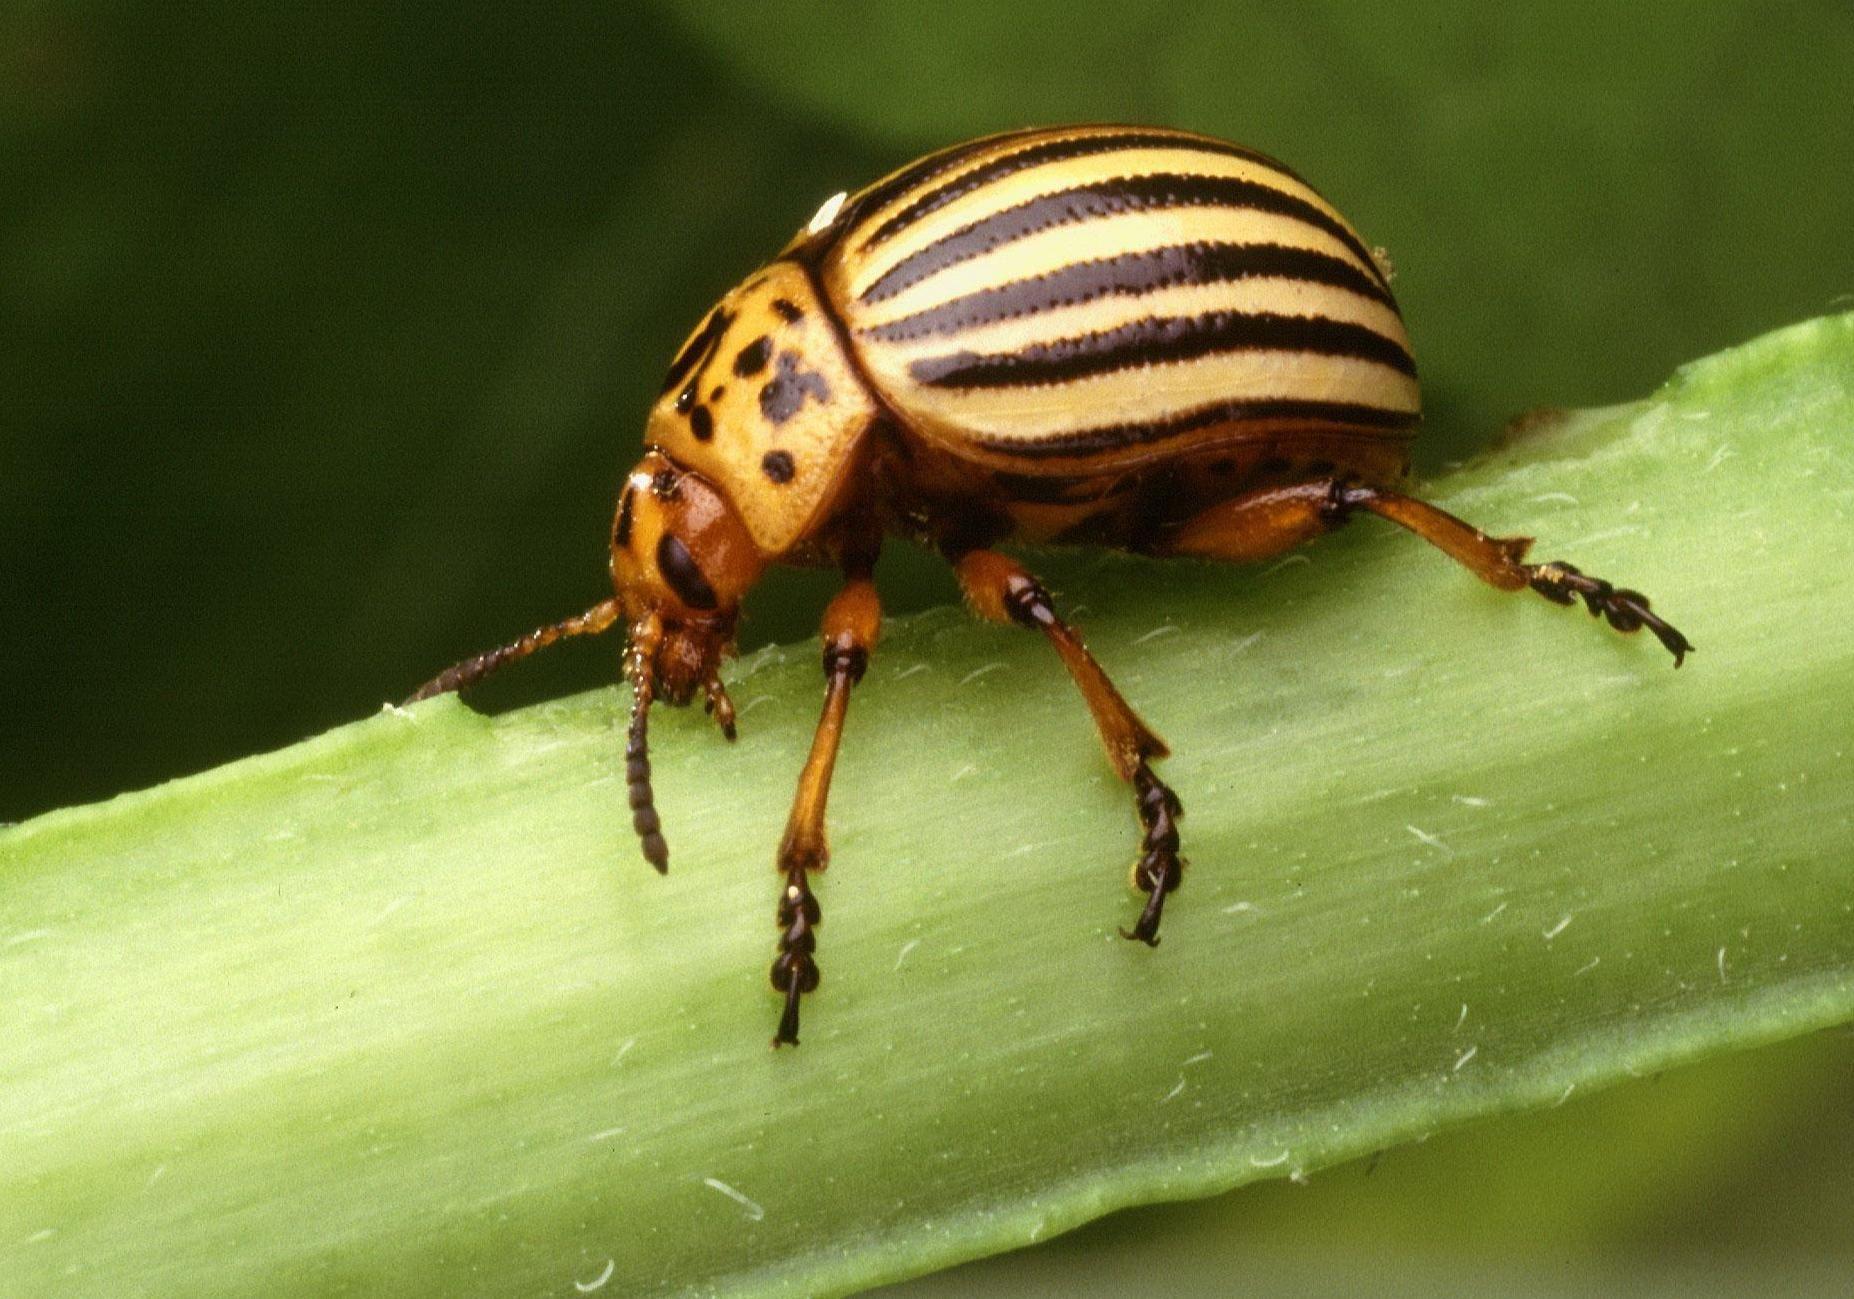 Description Colorado potato beetle leptinotarsa decemlineata insect ...: commons.wikimedia.org/wiki/file:colorado_potato_beetle_leptinotarsa...